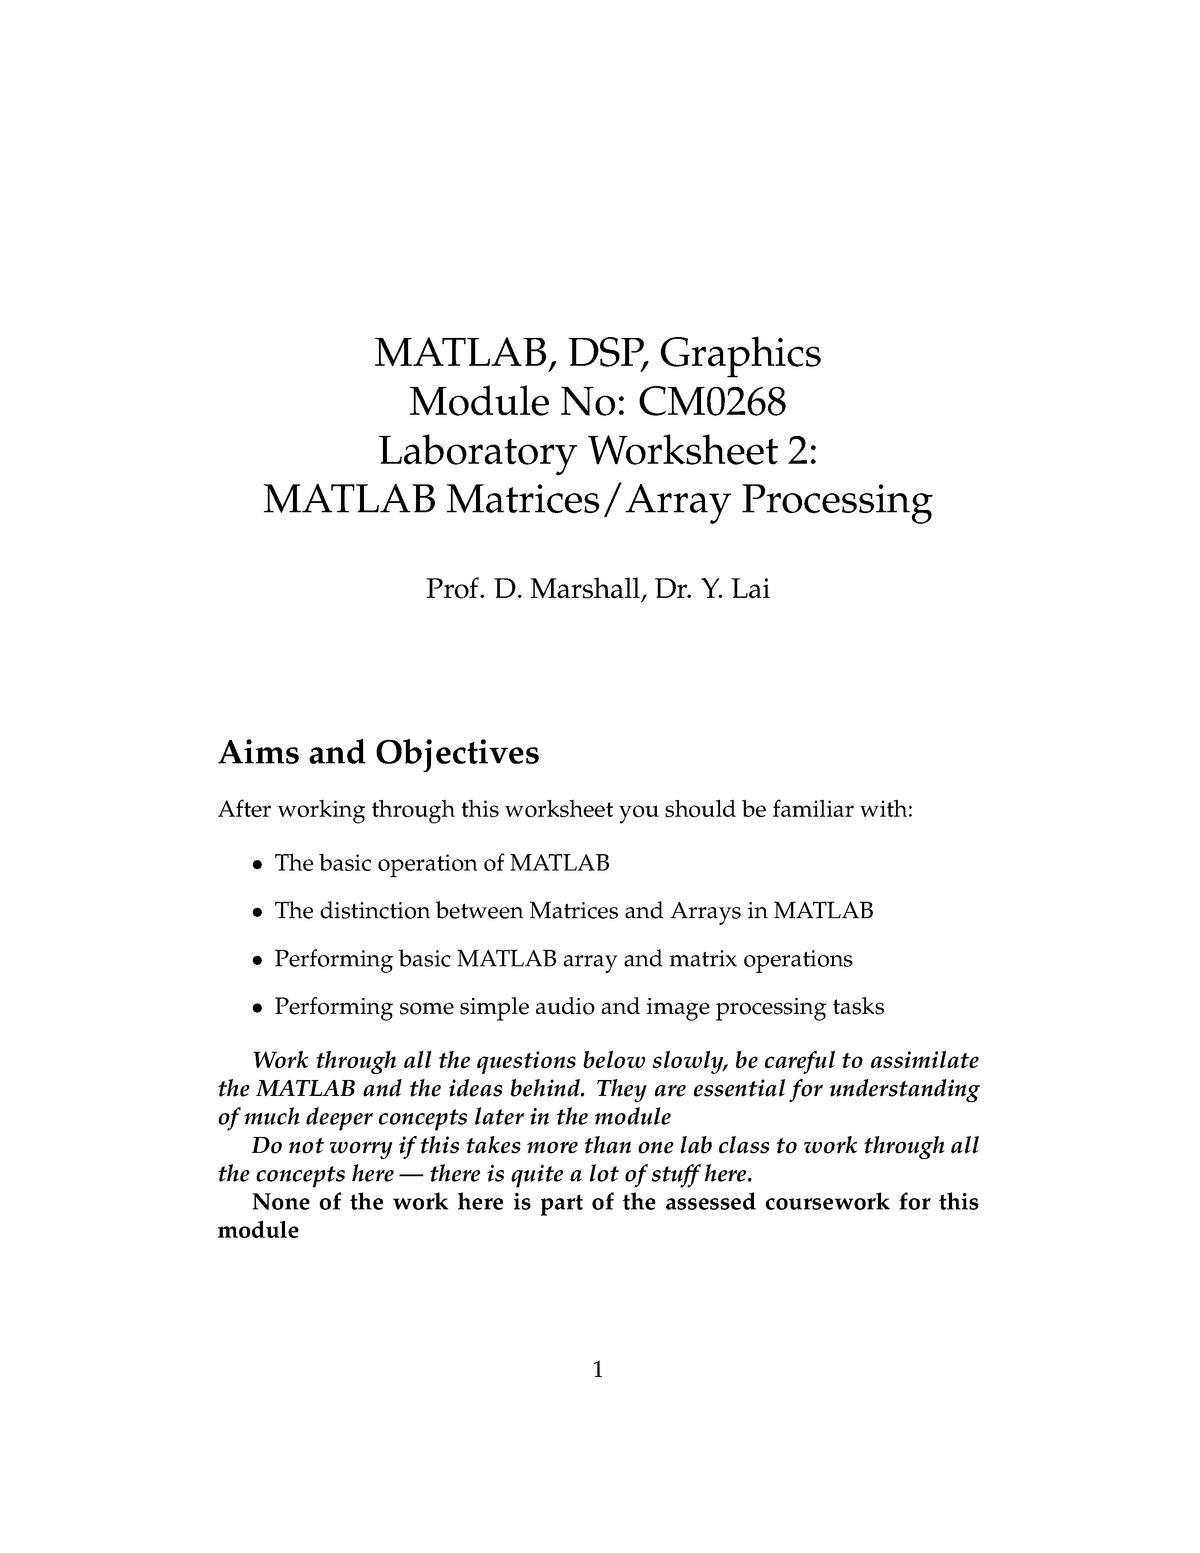 Lab Sheet 2: MATLAB Matrices/Array Processing - CM0268 - StuDocu